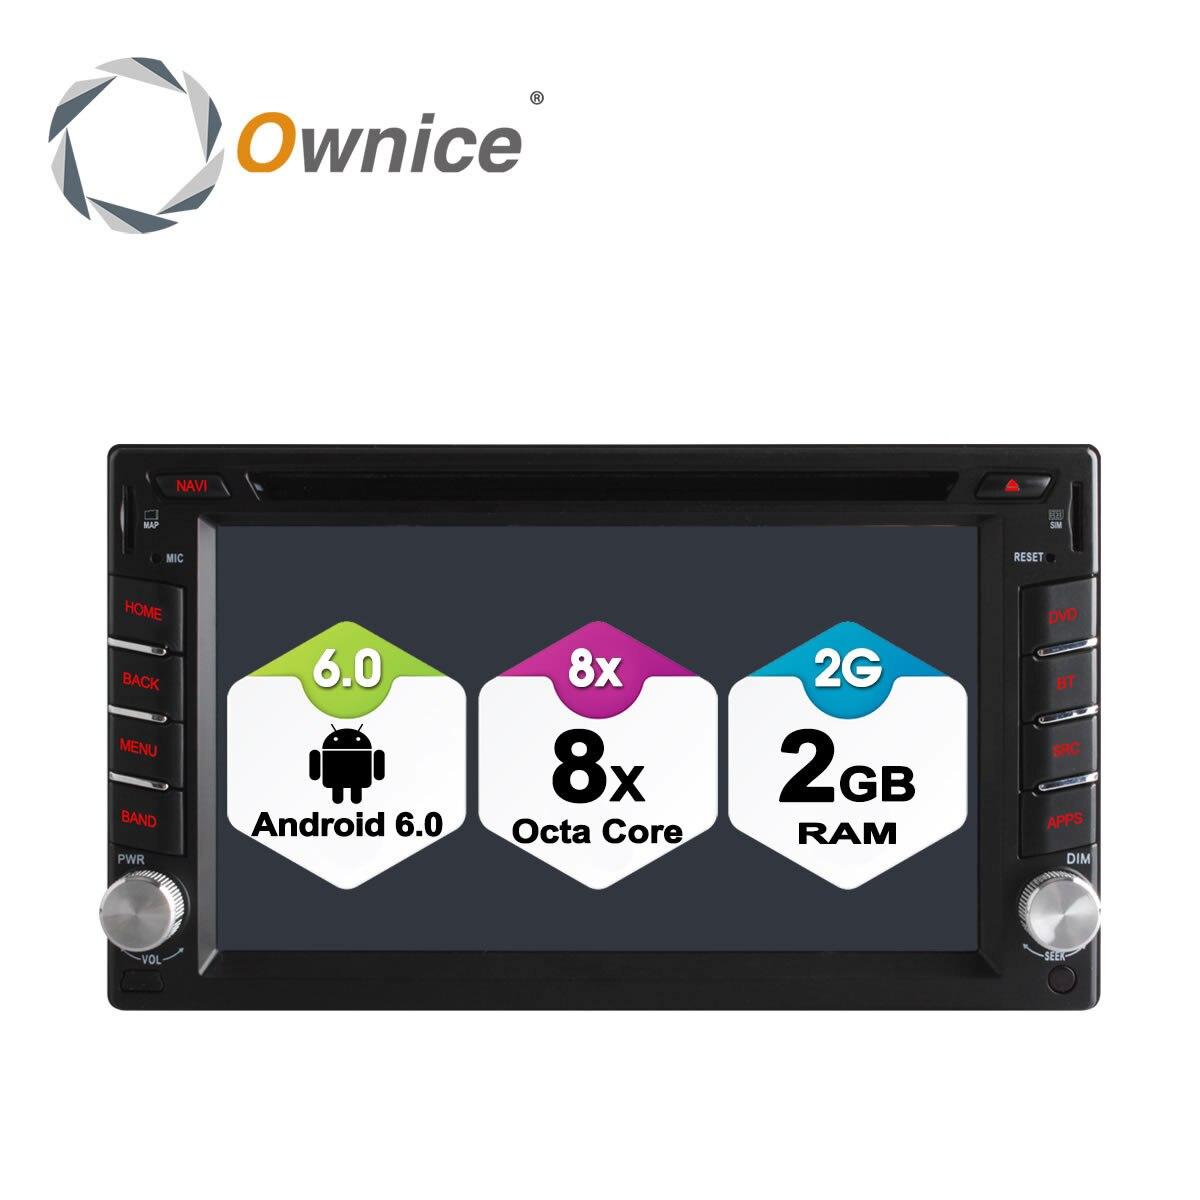 Ownice 4G SIM LTE Android 6.0 Octa Core 2G RAM Universal Auto Radio Auto 2 Din Auto DVD Player in Dash GPS Stereo Kopf Einheit